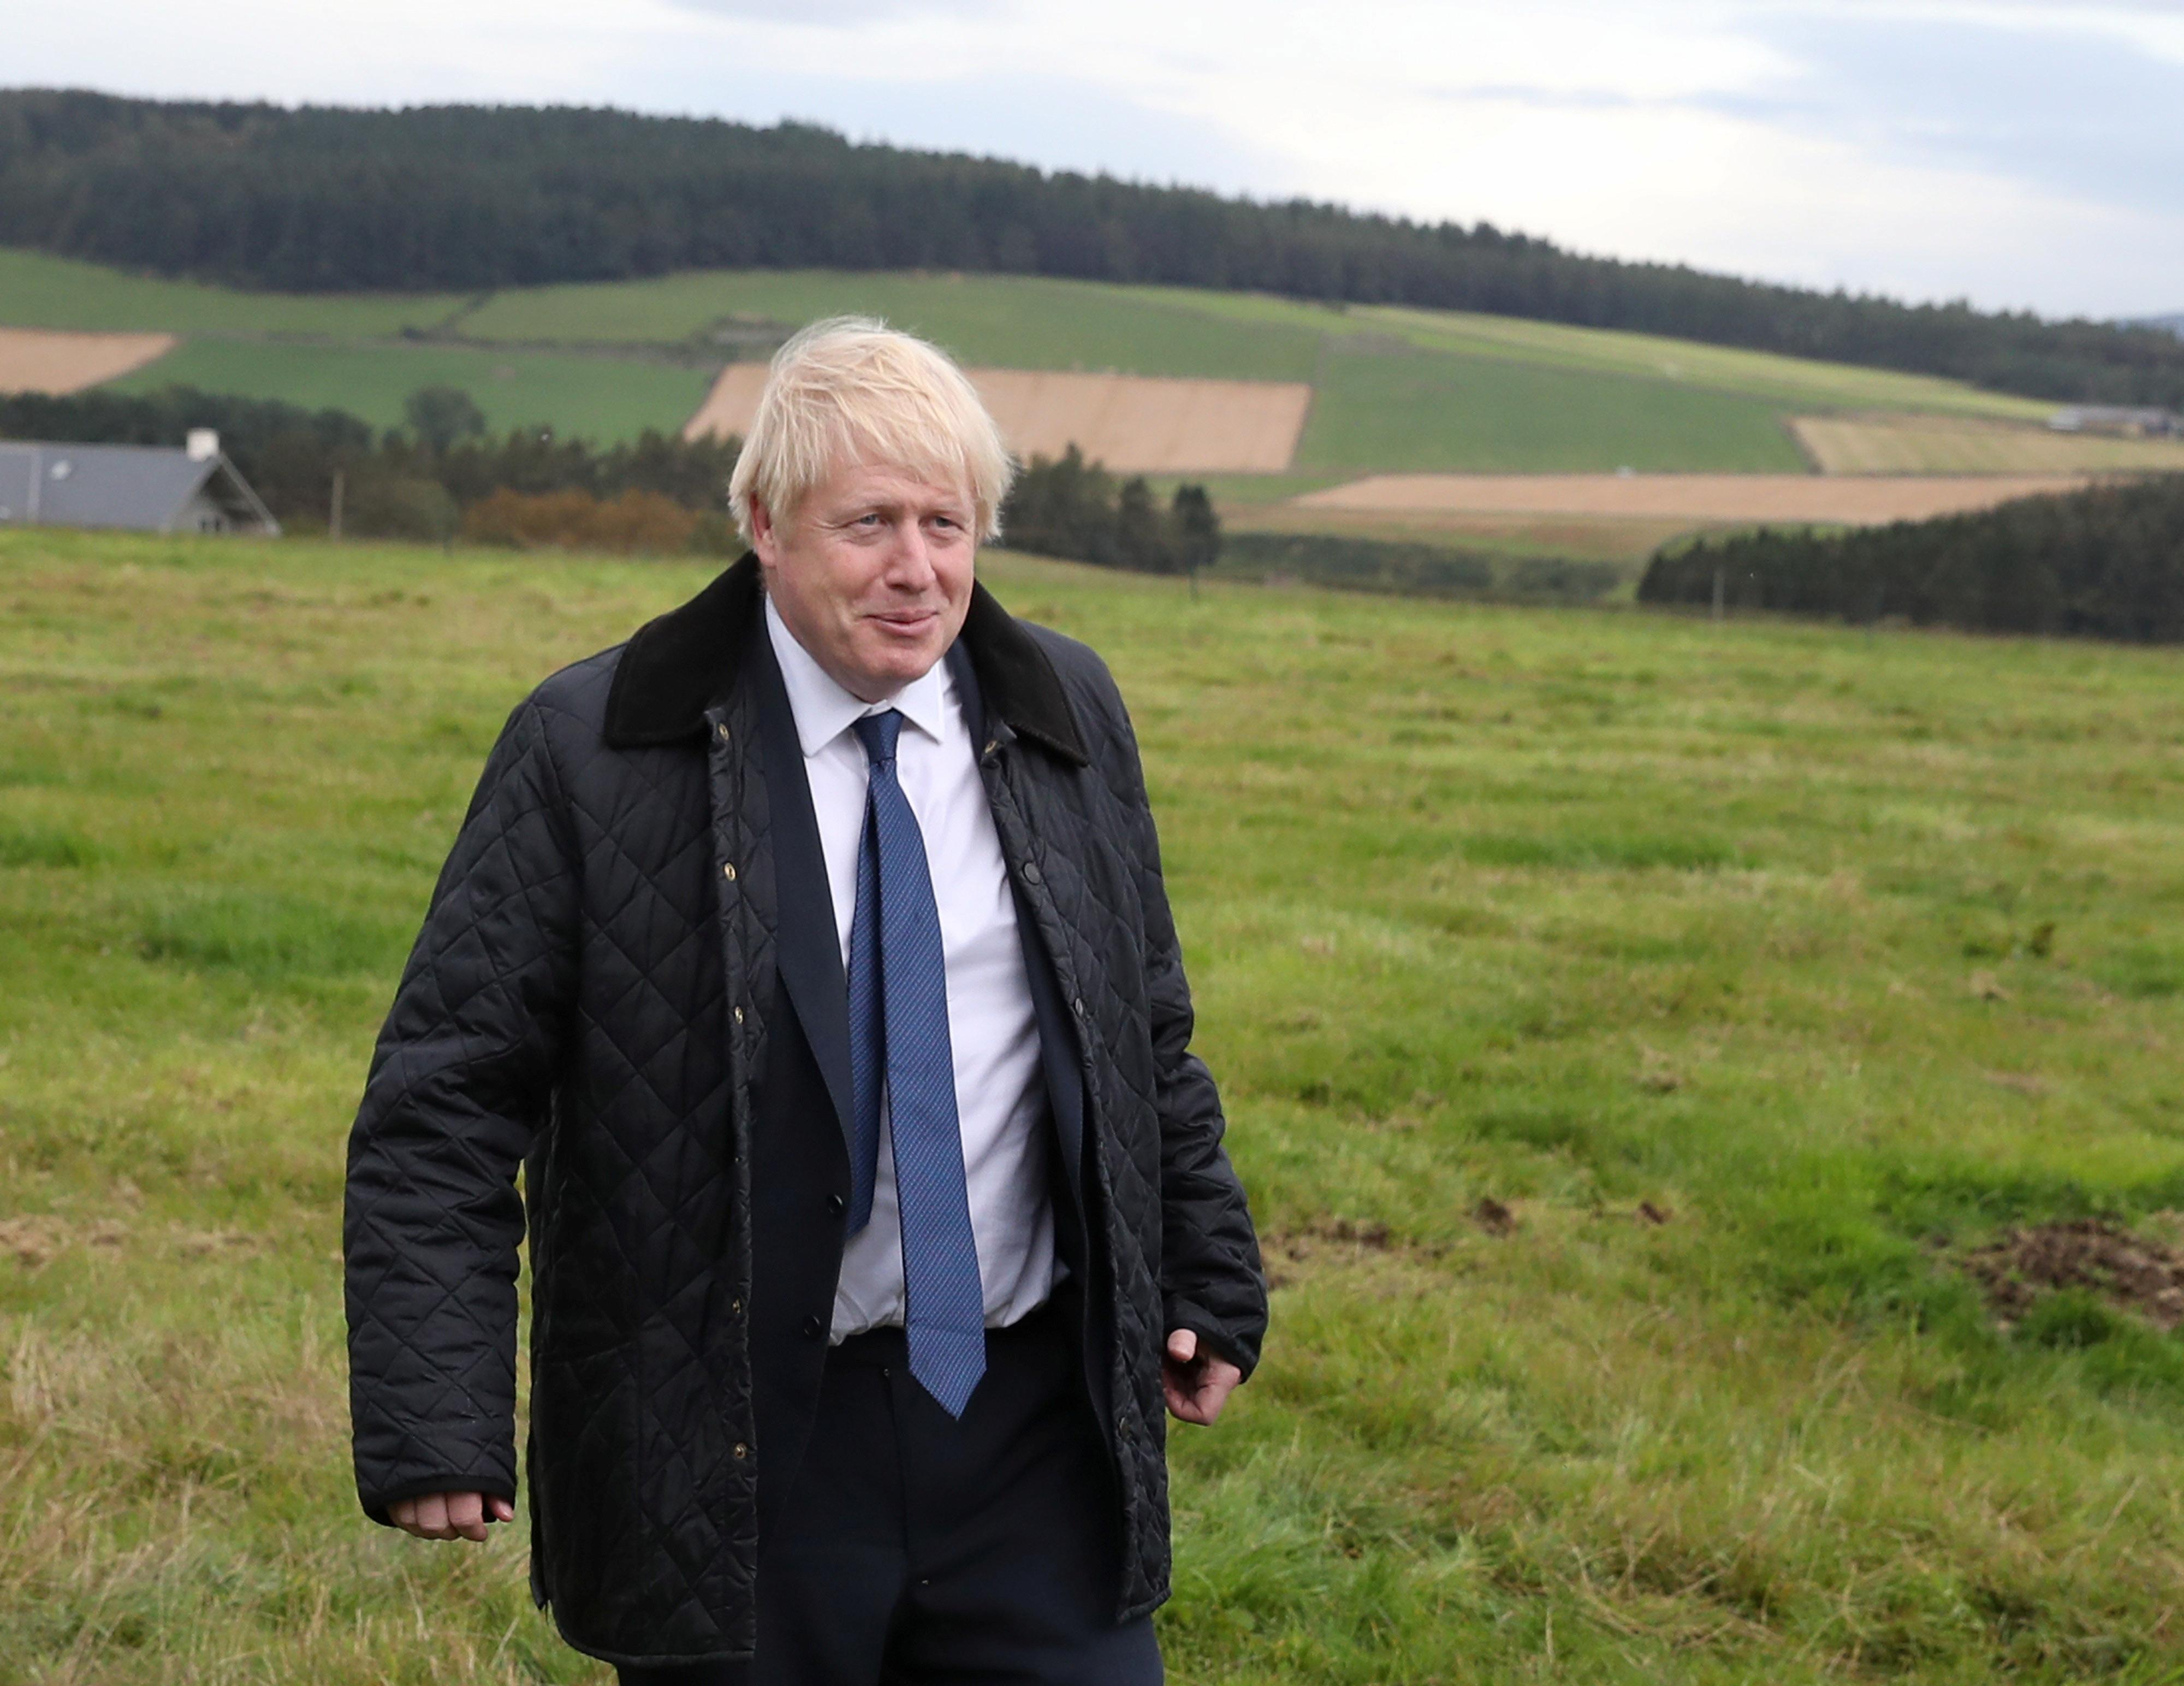 Britain's Prime Minister Boris Johnson visits Darnford Farm in Darnford, Banchory near Aberdeen, Scotland, Britain September 6, 2019. Andrew Milligan/Pool via REUTERS